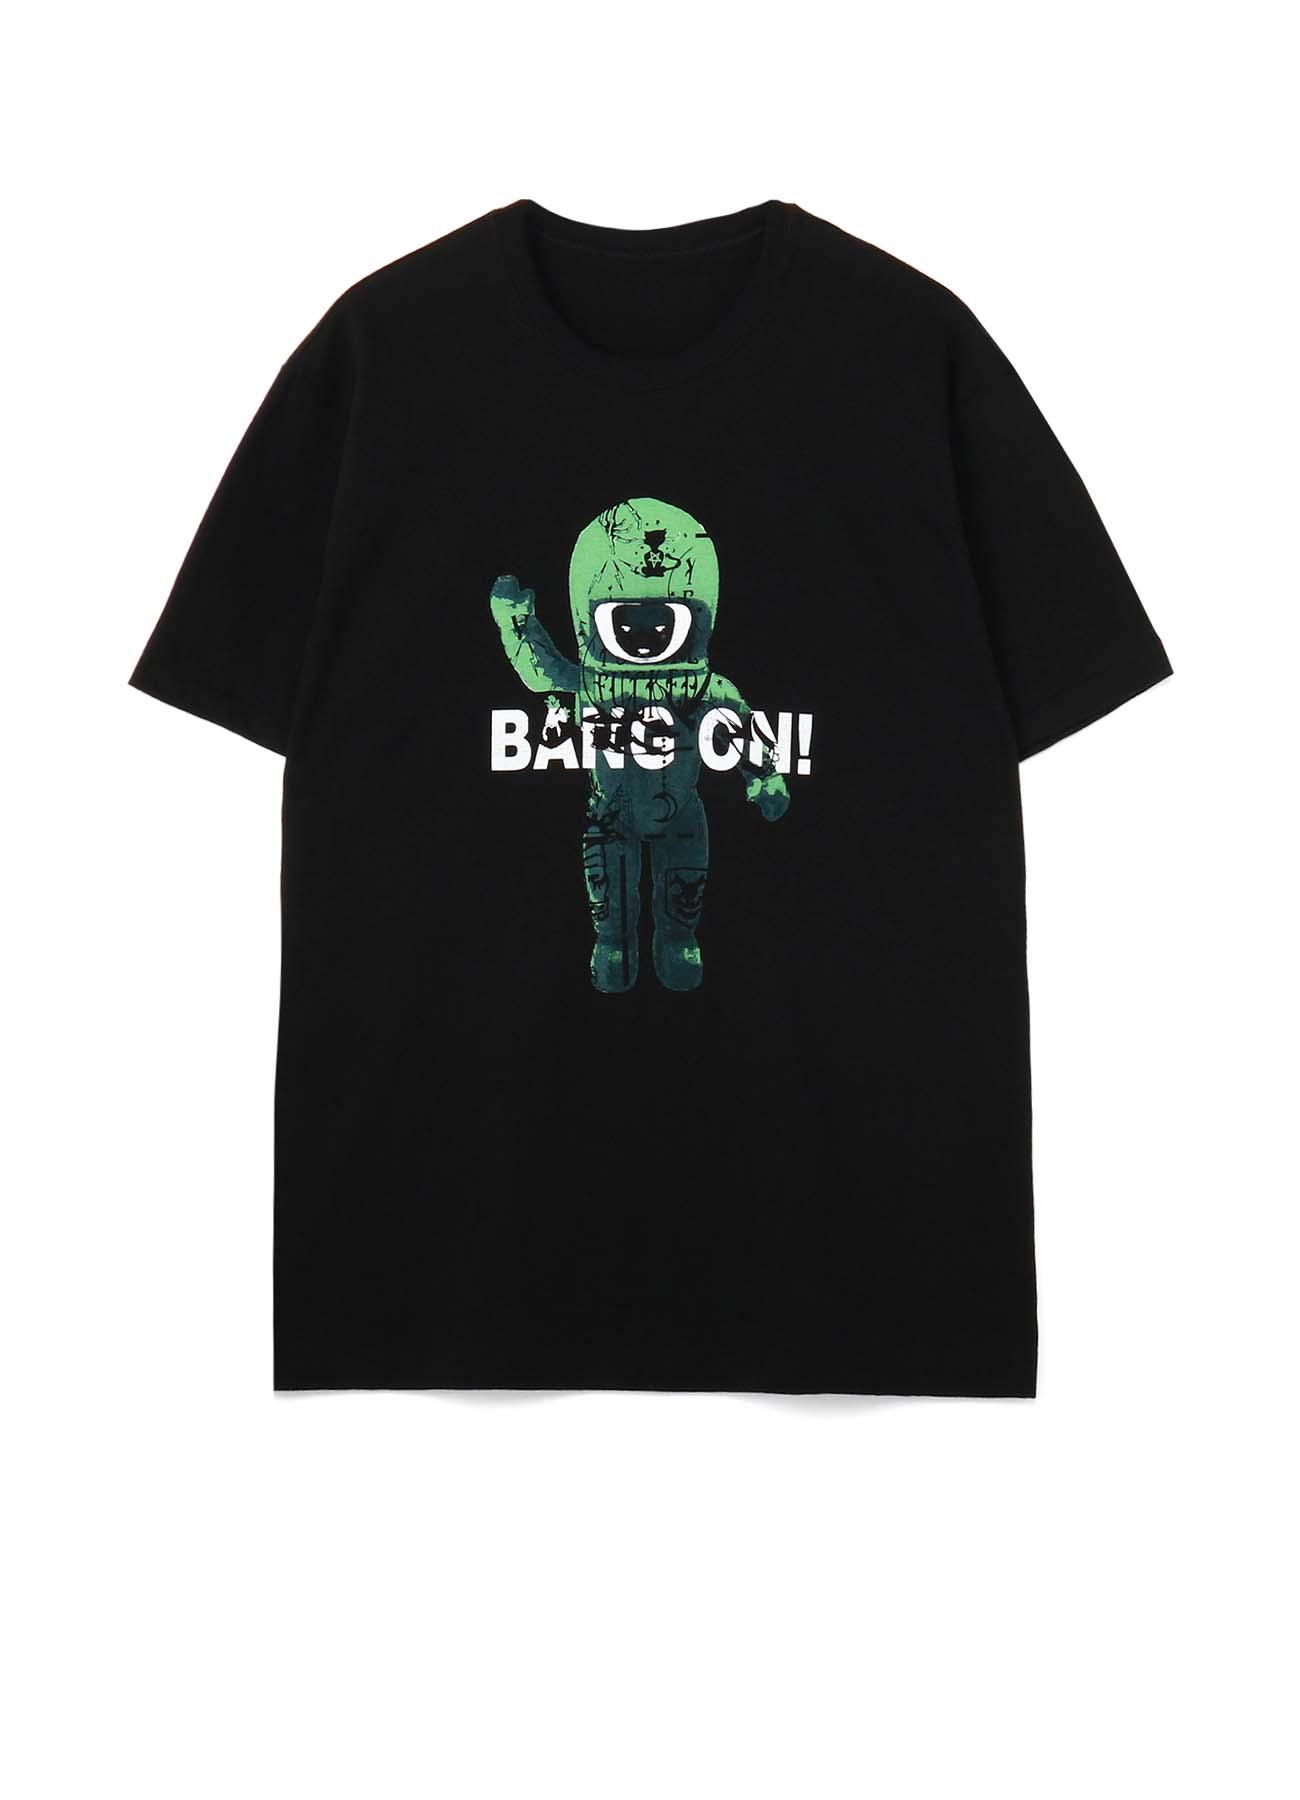 Y's BANG ON! Astronaut-Tshirts